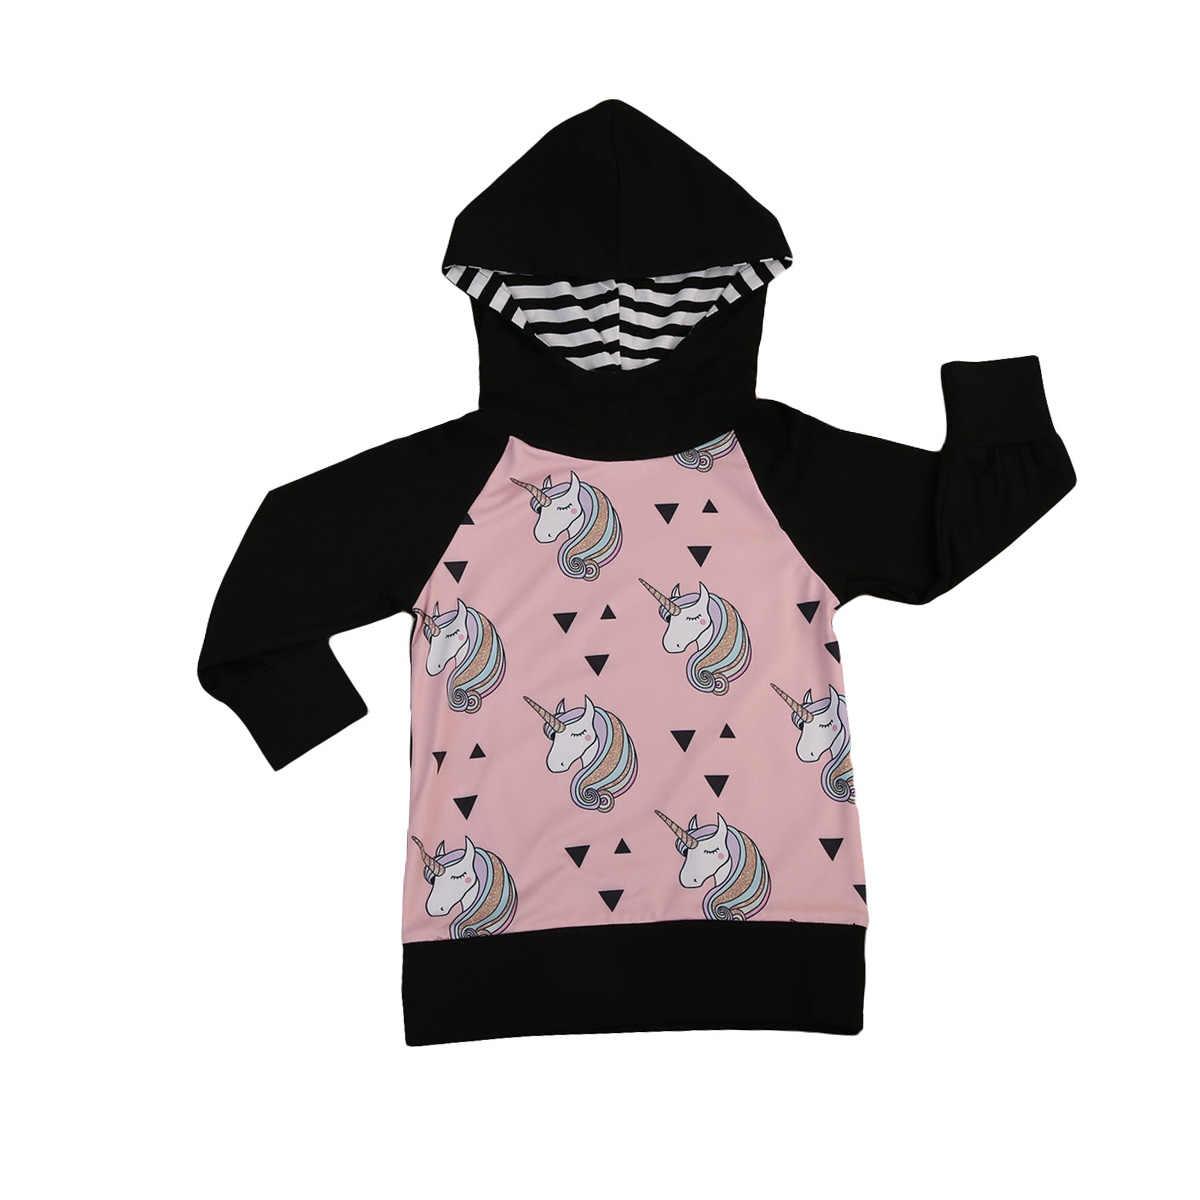 in Stock Unicorn Pattern Child Kid Girls Hooded Coat Jacket Casual Outerwear Autumn1-5Year